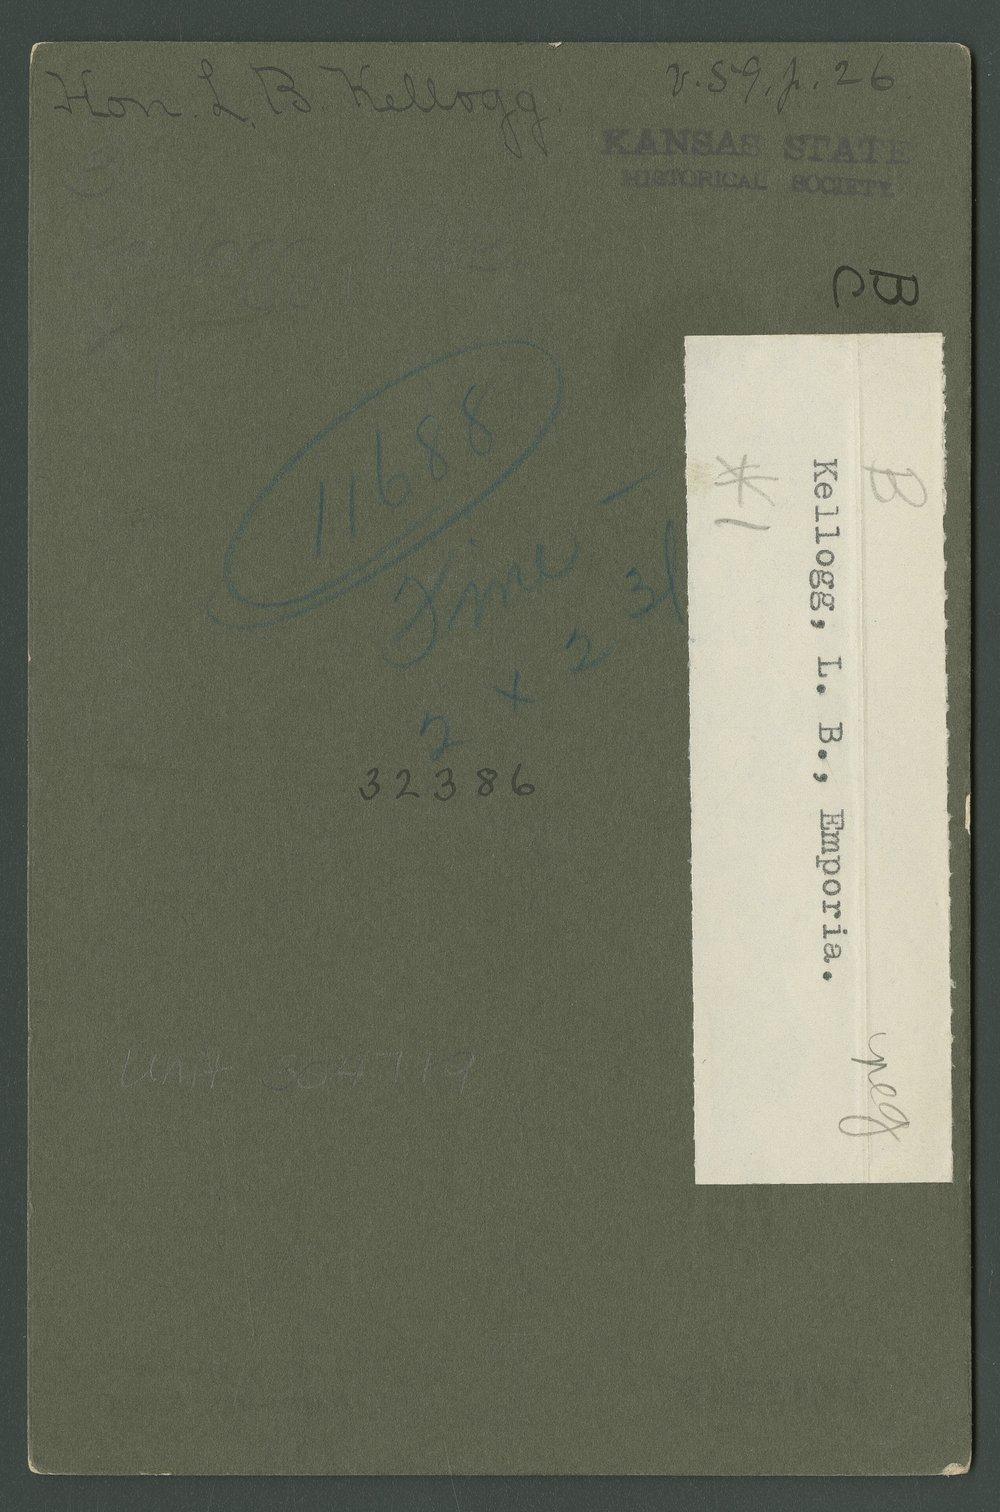 Lyman Beecher Kellogg - 2